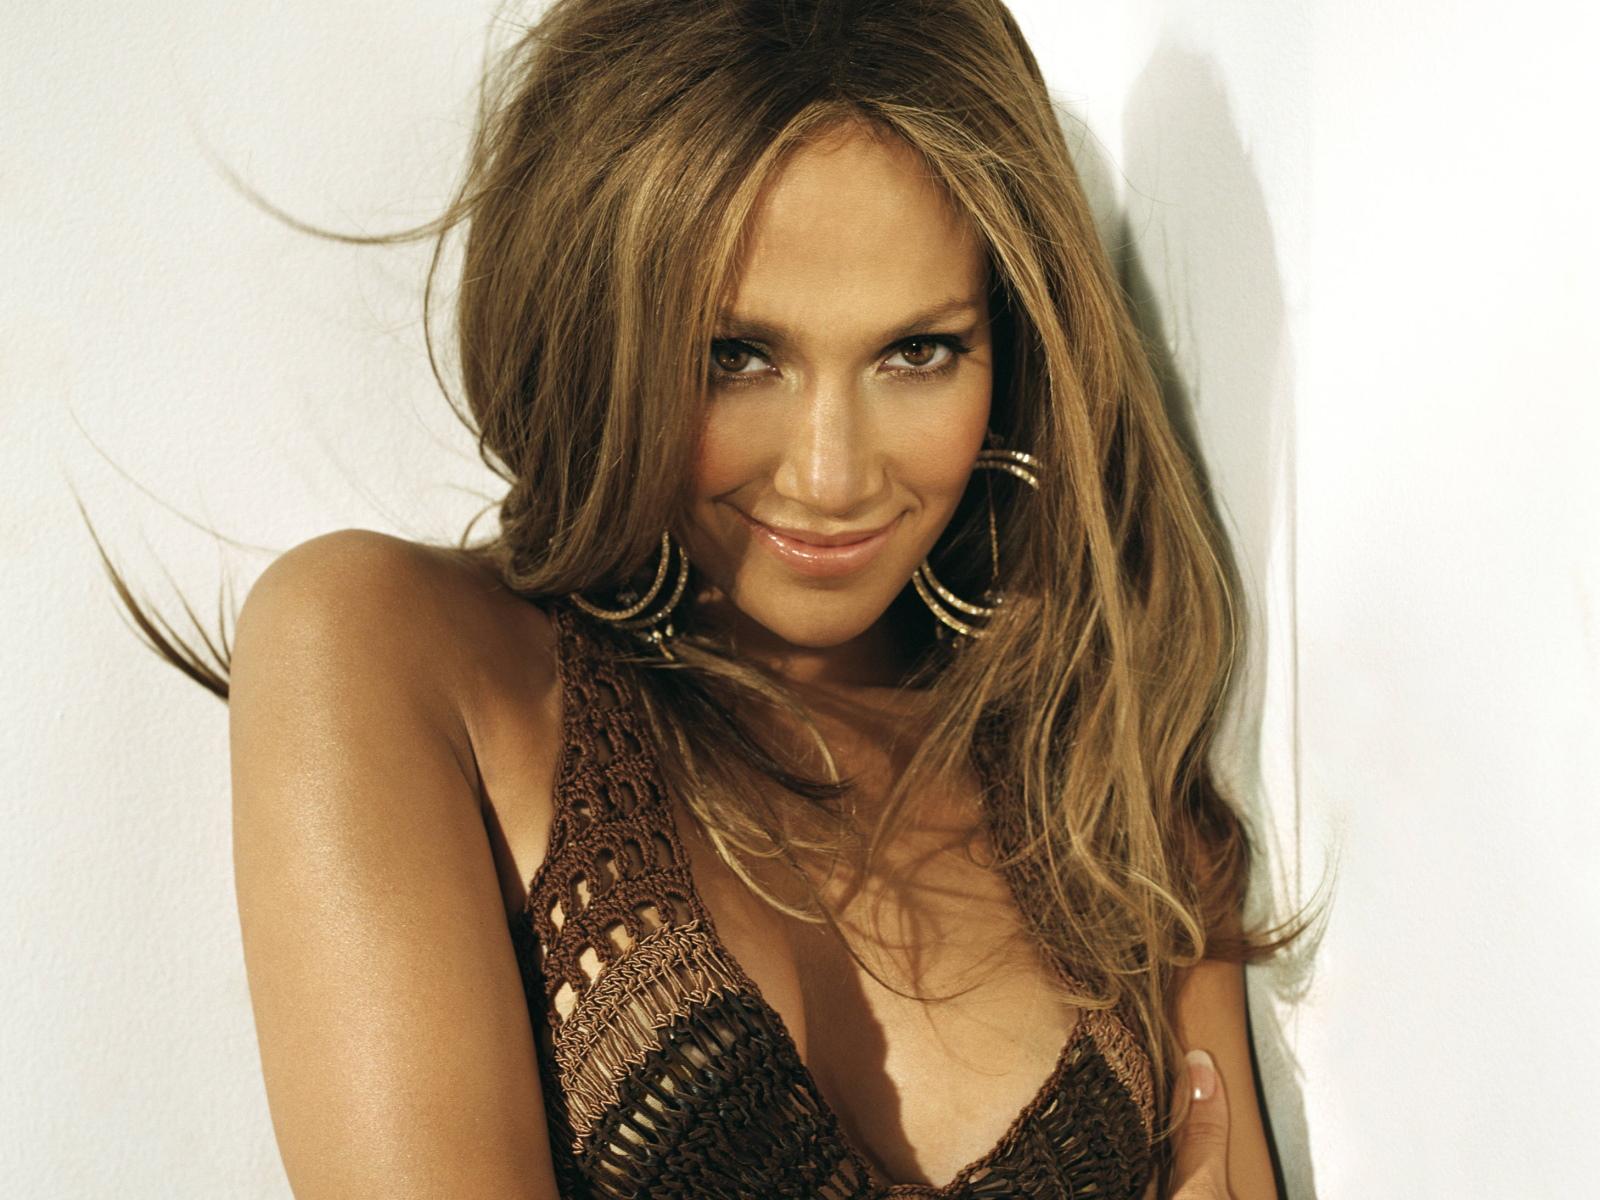 ... wallpapers jennifer lopez jennifer lopez jennifer lopez jennifer lopez Jennifer Lopez